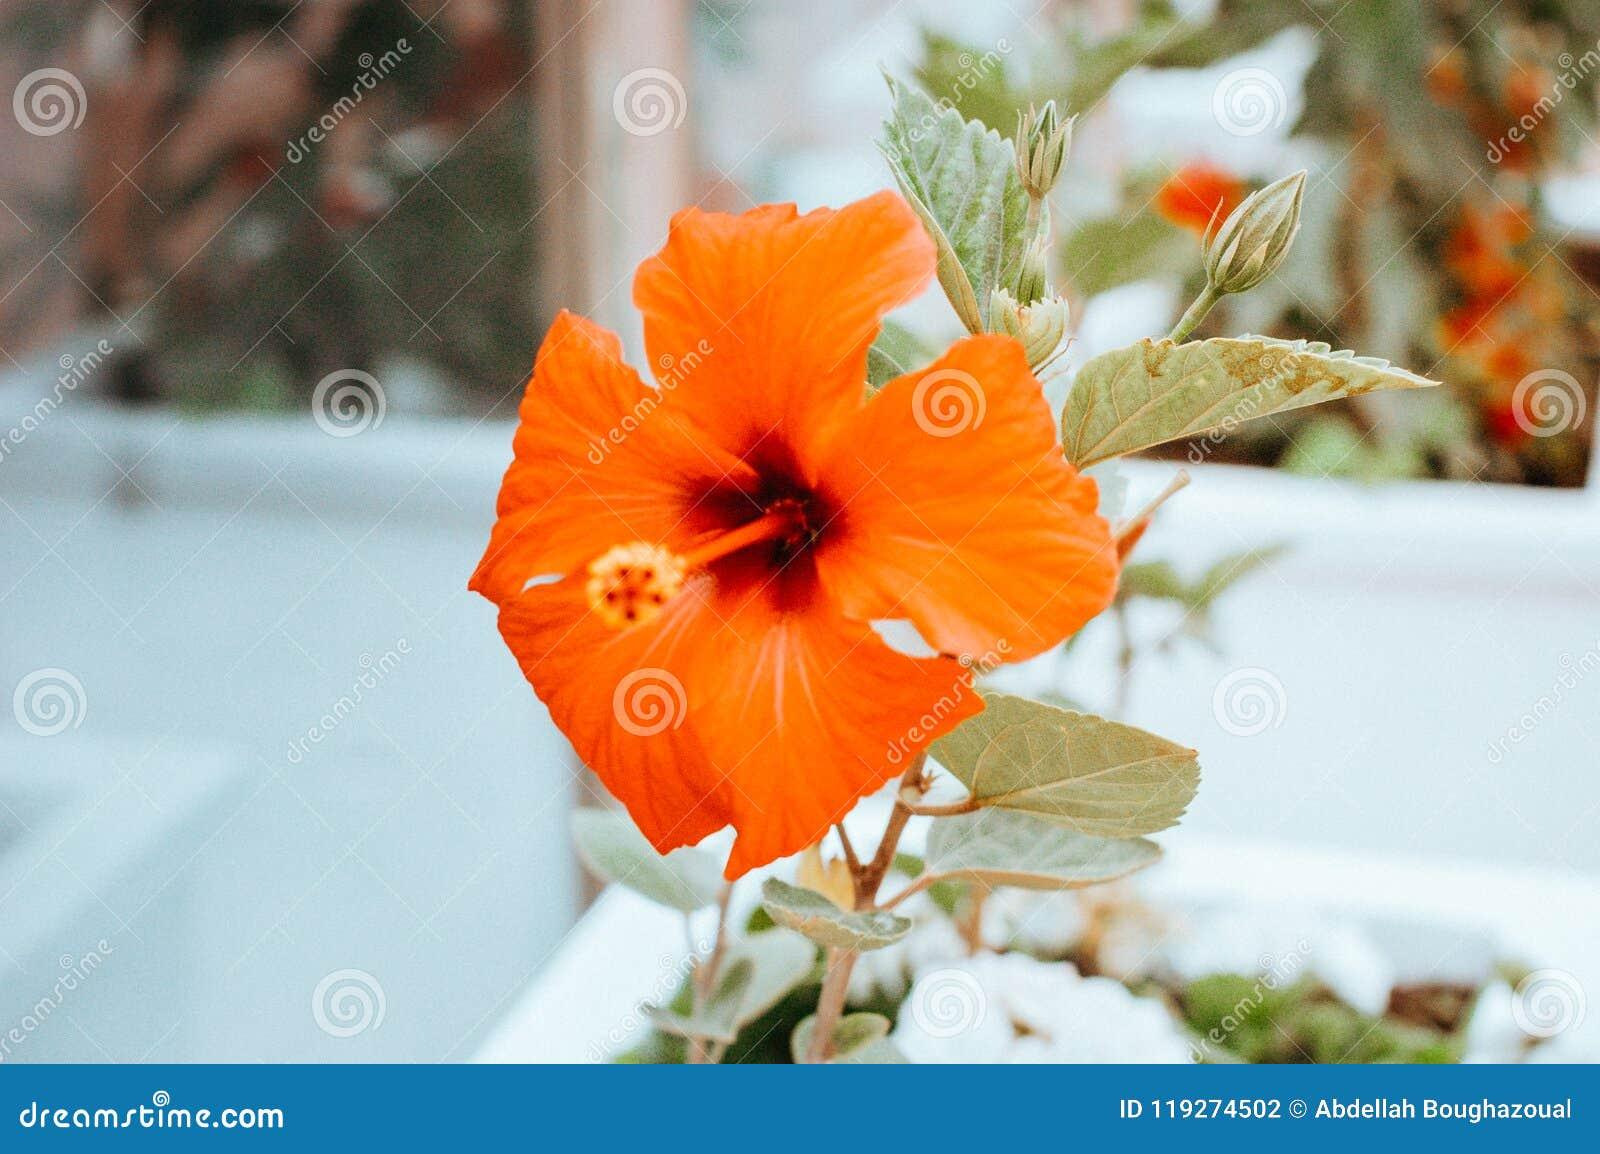 Orange Smooth Flowers In Garden Stock Photo Image Of Green Tree